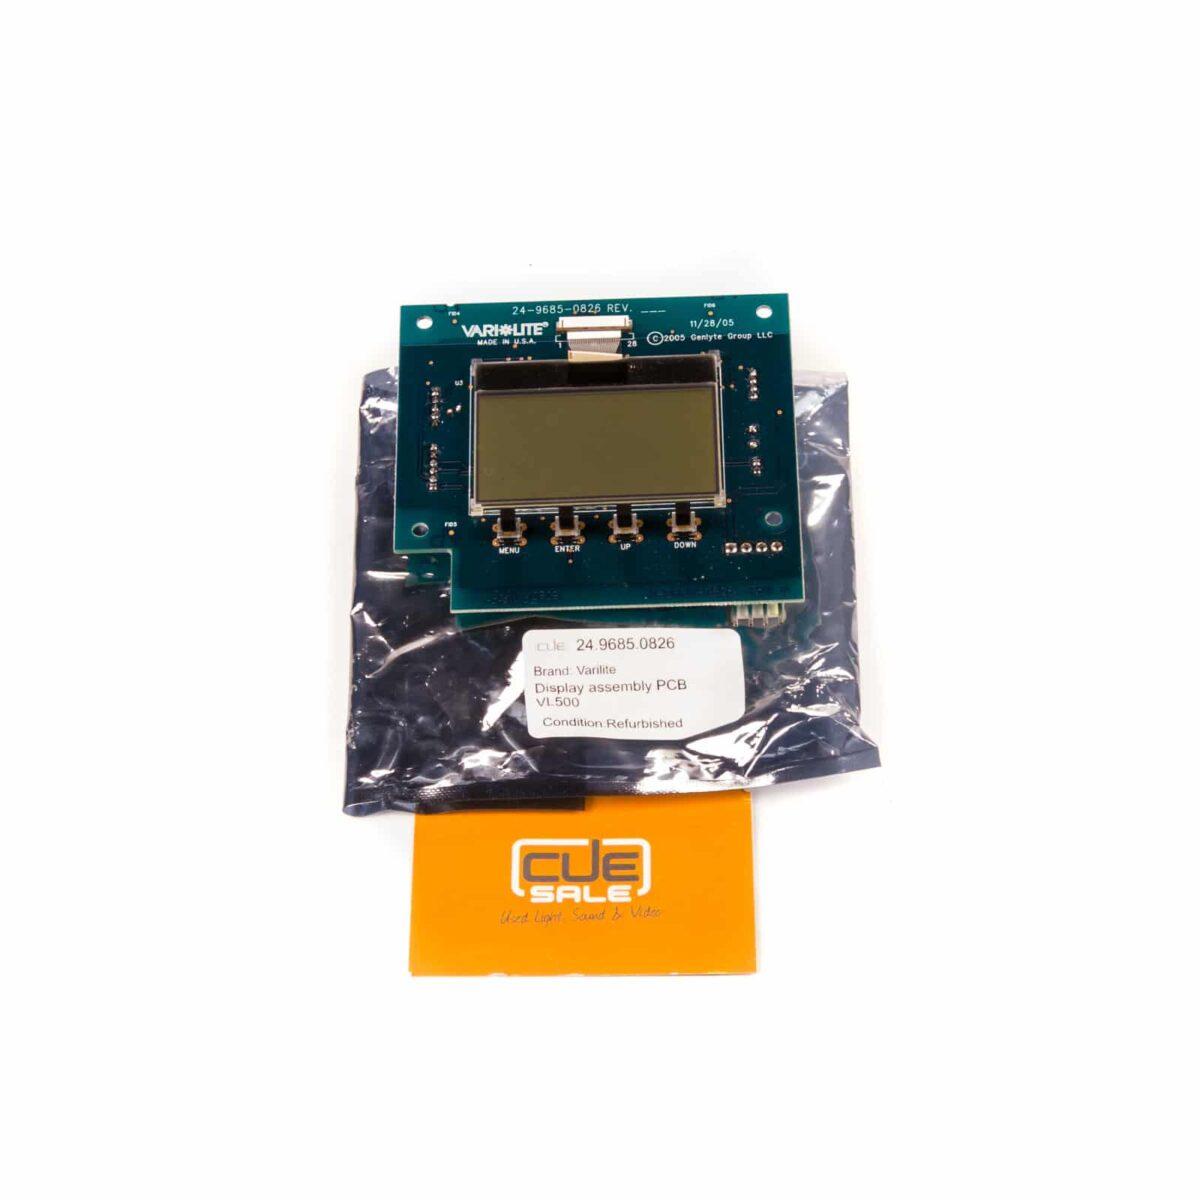 Vari*Lite Display Assembly PCB vl500